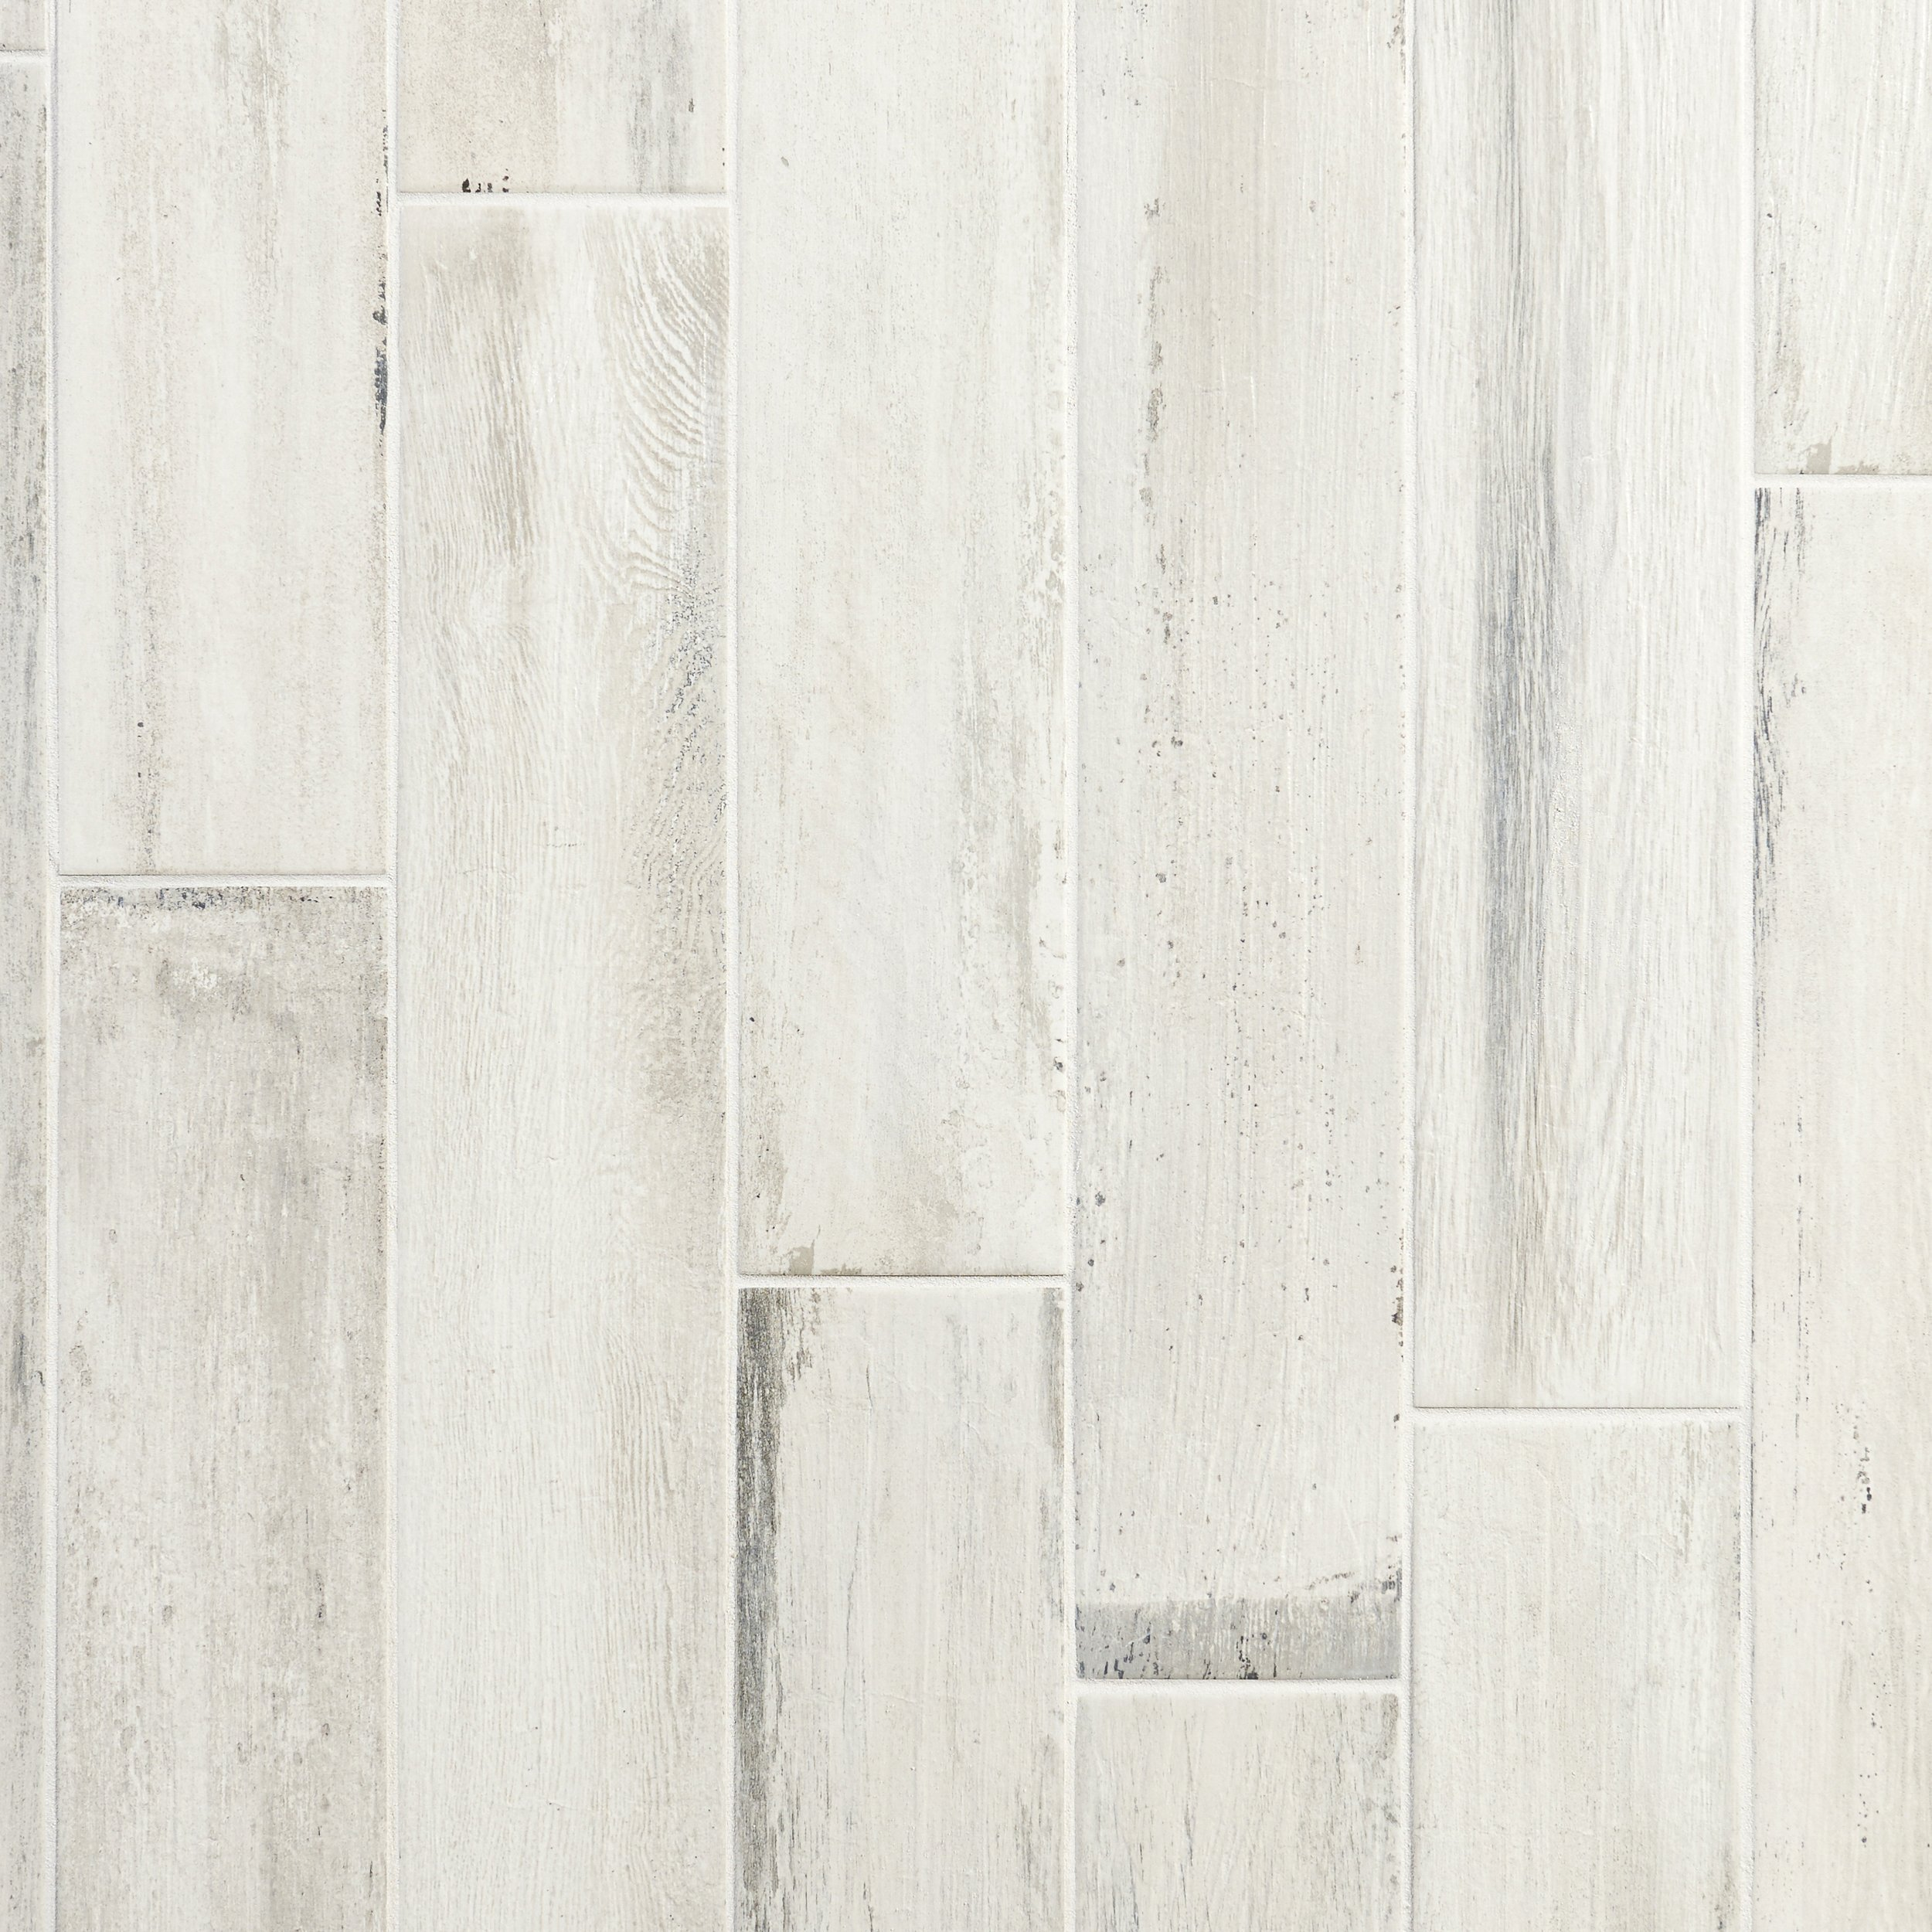 Porcelain Tile Wood Plank: Amber White Wood Plank Porcelain Tile